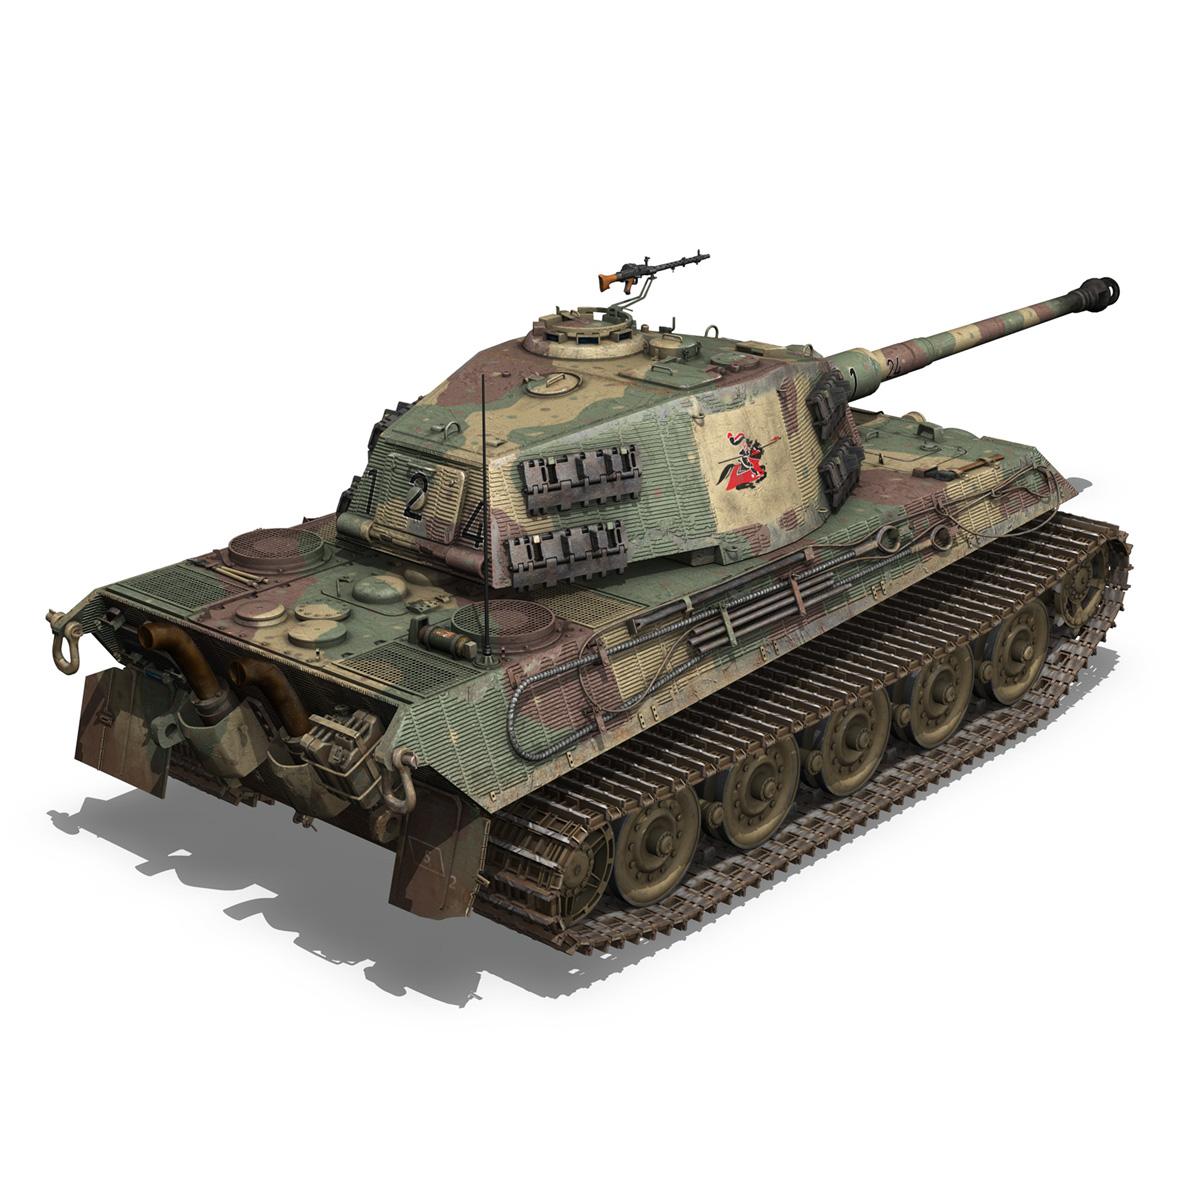 Panzerkampfwagen VI - Ausf B - Tiger II - 124 3d model 3ds c4d lwo lws lw obj 273759